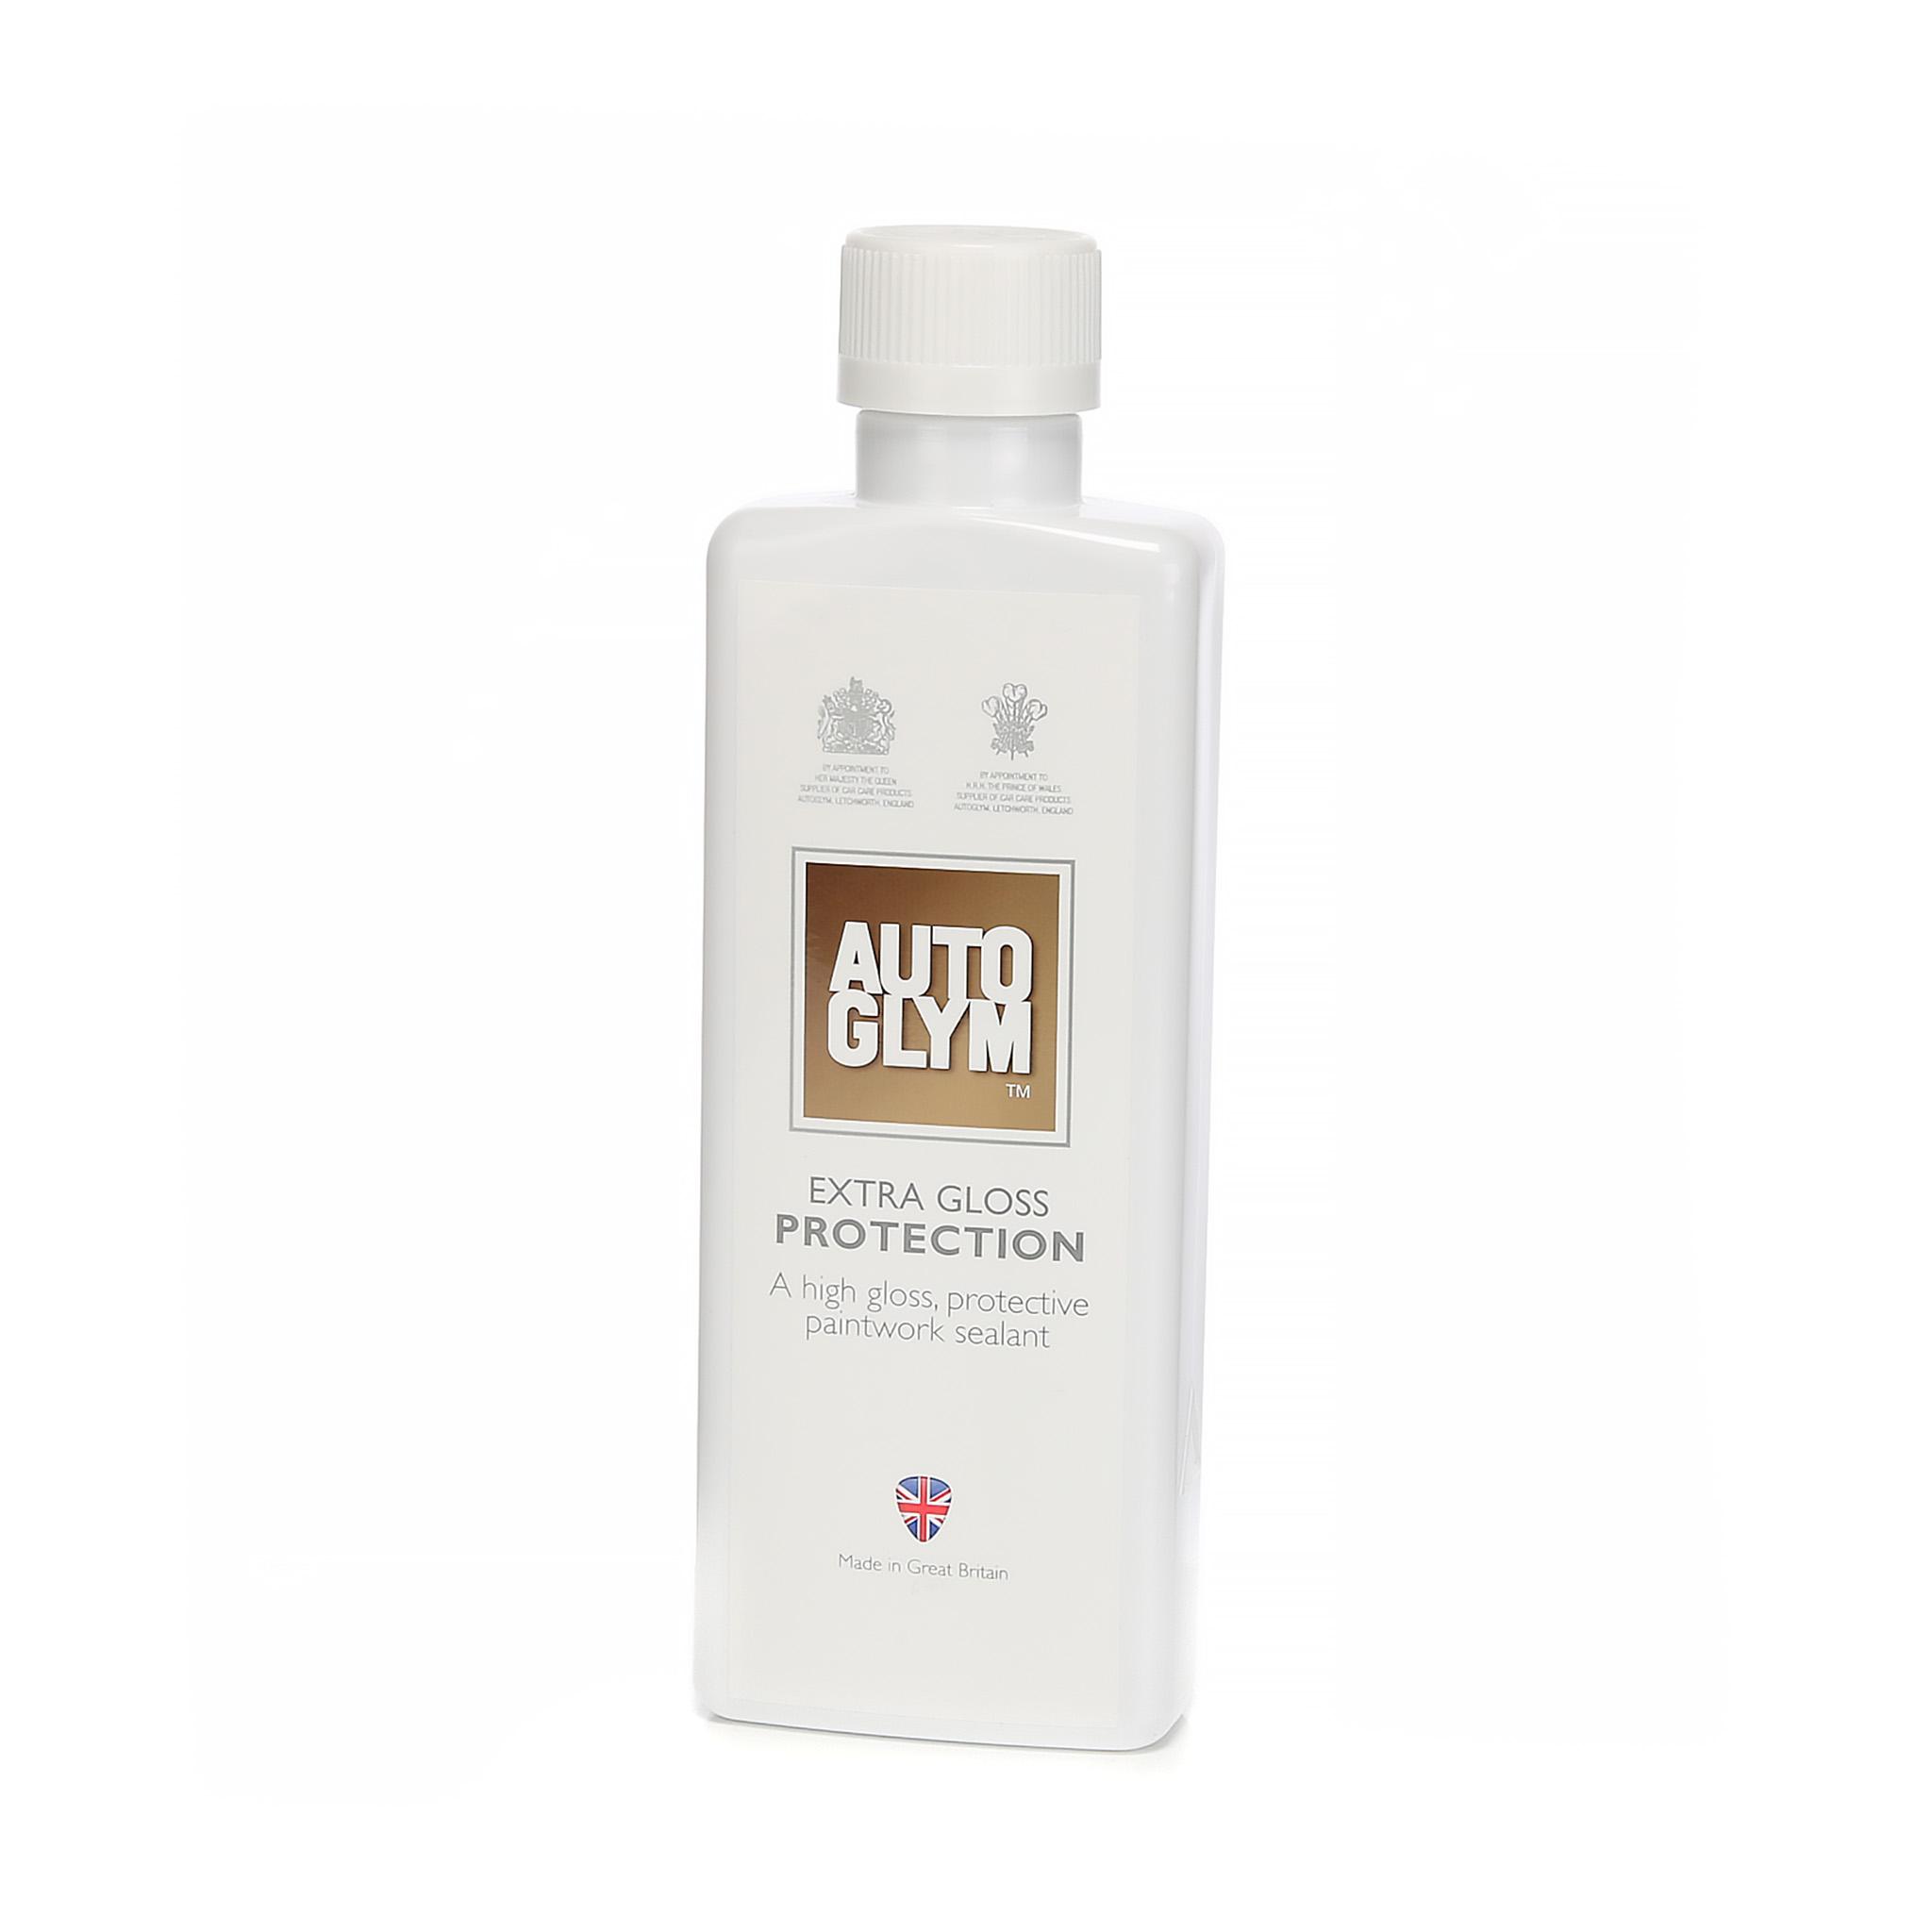 Bilvax Autoglym Guld Extra Gloss Protection, 325 ml